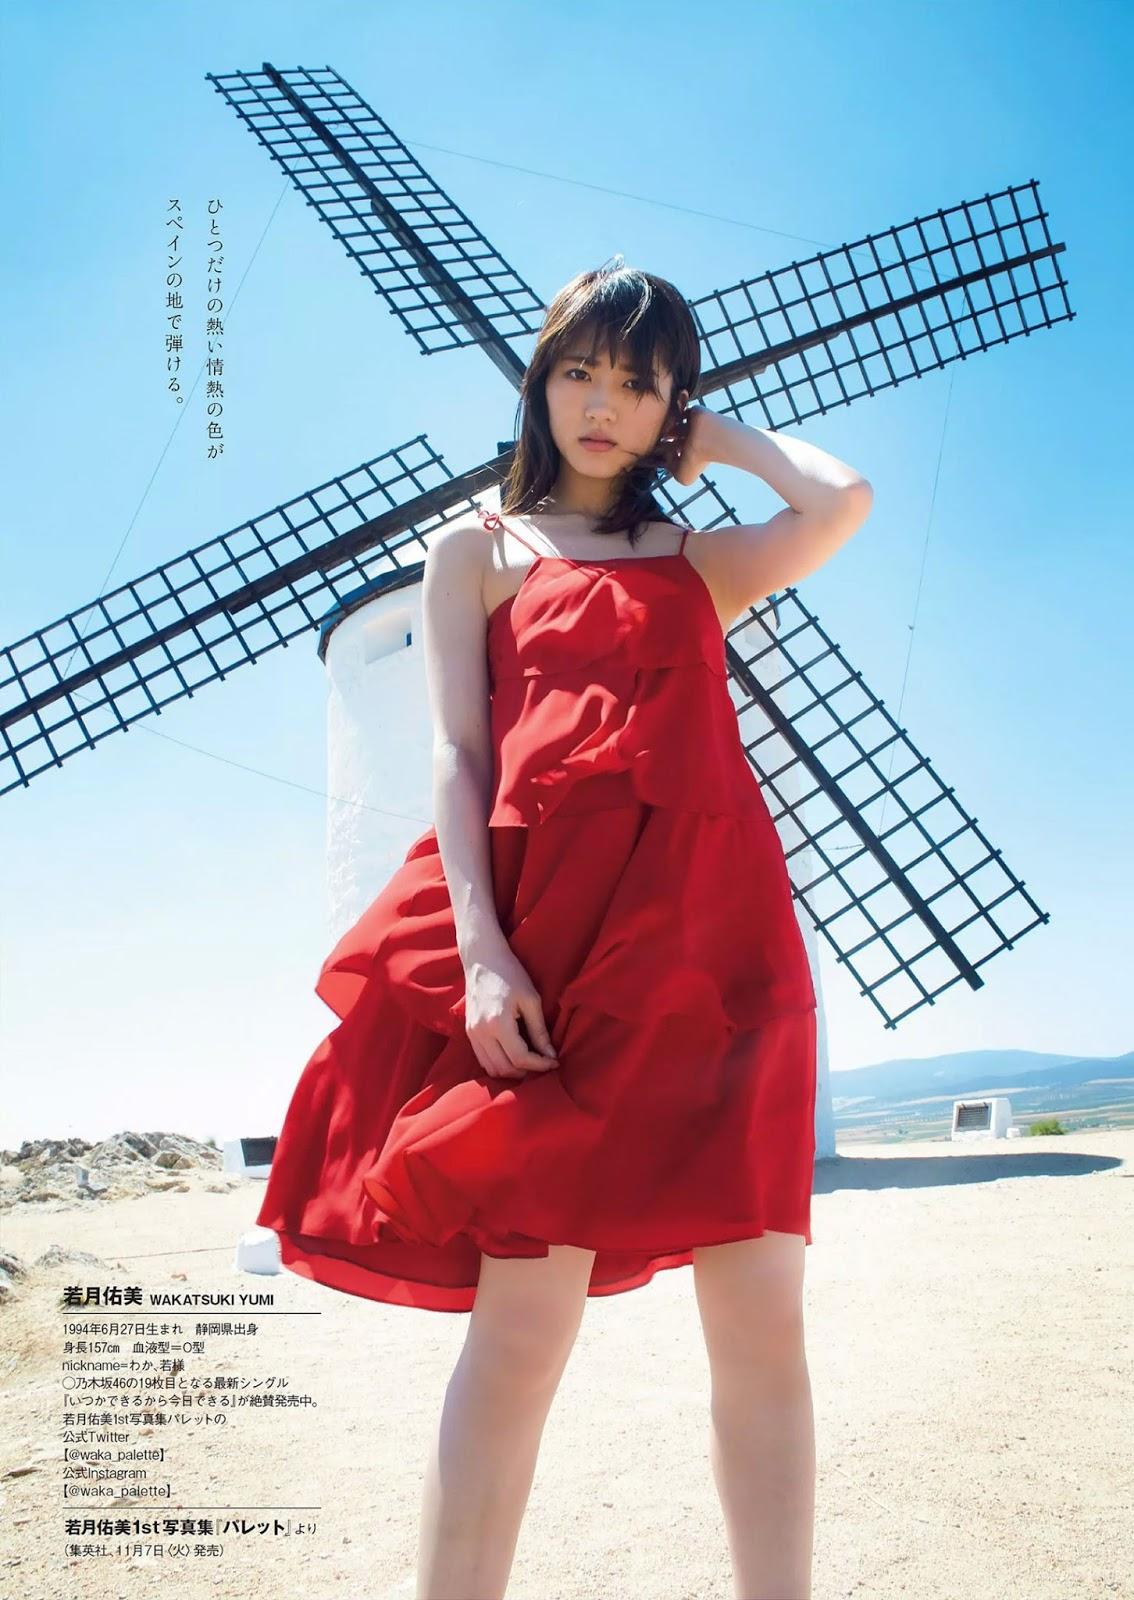 Wakatsuki Yumi 若月佑美, Weekly Playboy 2017 No.47 (週刊プレイボーイ 2017年47号